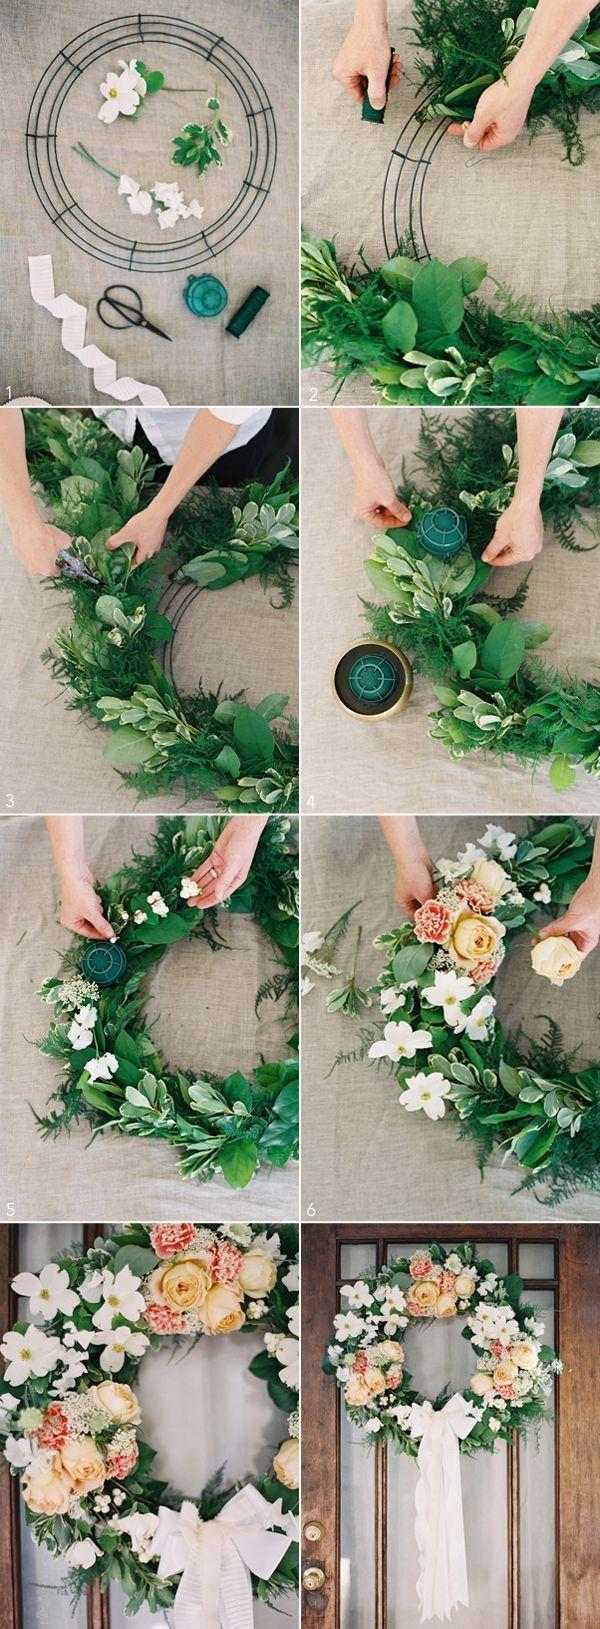 Floral Wreath Inspiration+ DIY Wedding Wreath Tutorial | The Jane Society